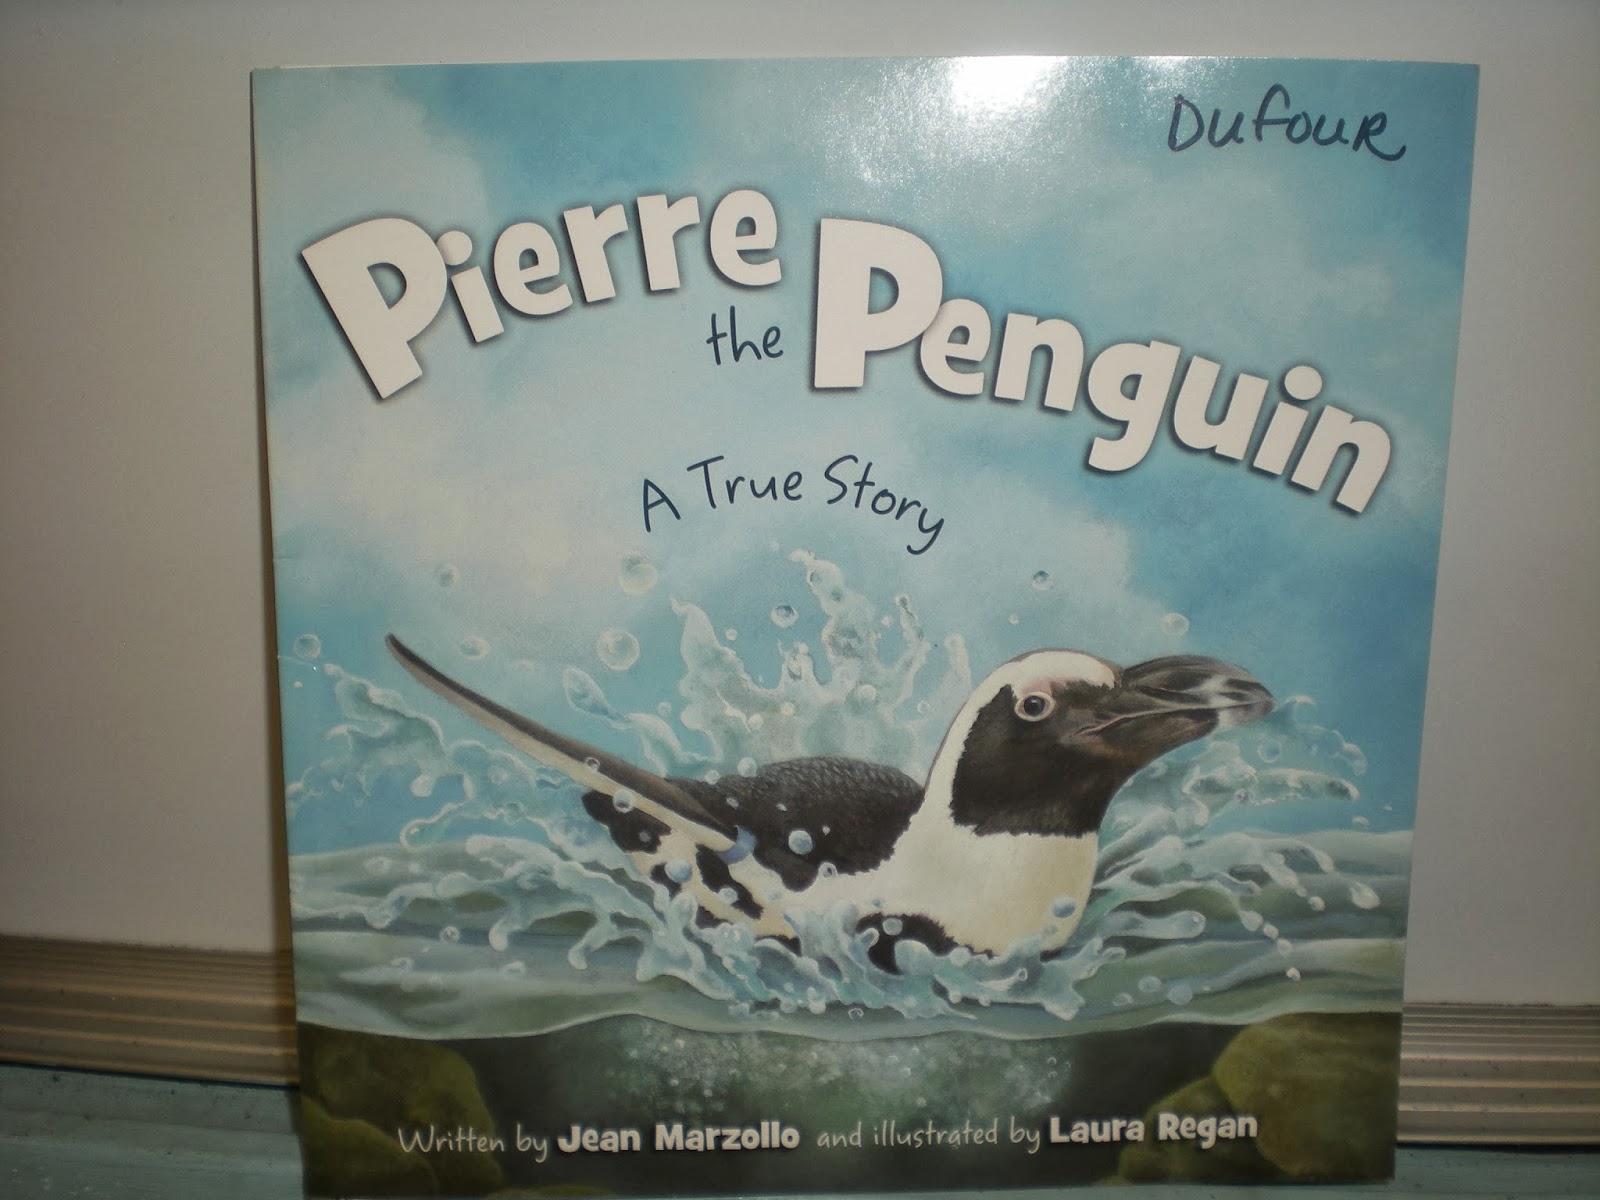 Essay Penguins - New York, NY, United States by Essay P.